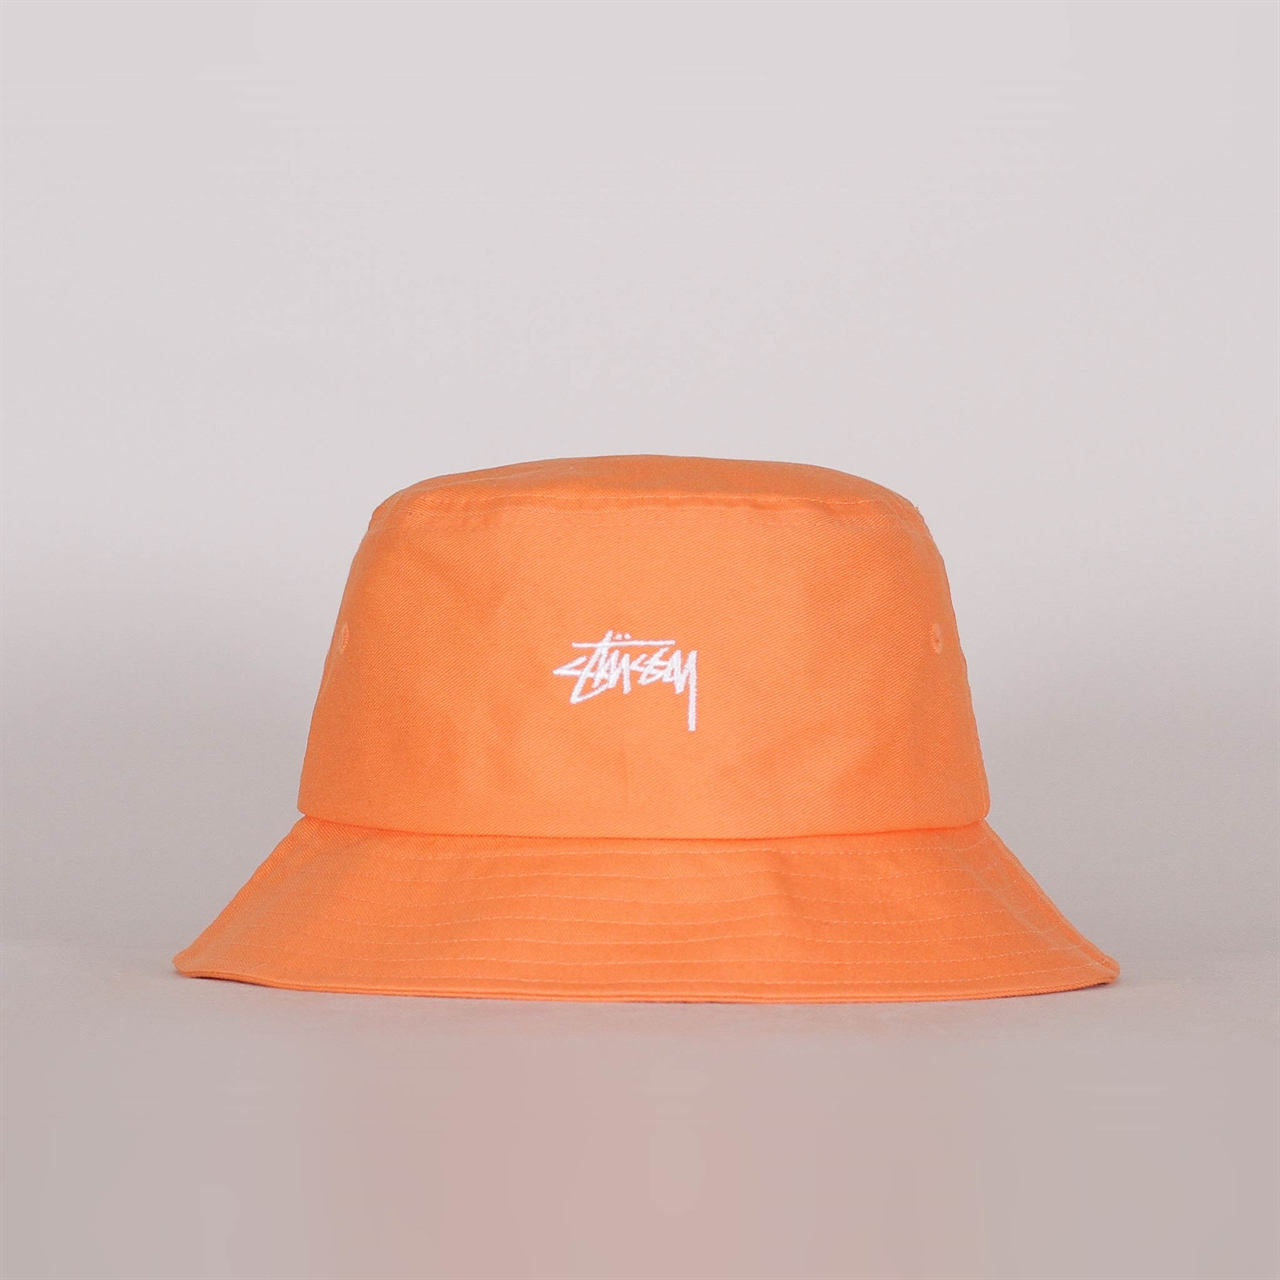 4d13e6de2ad90 Shelta - Stussy Stock Bucket Hat Peach (132917-PCH)